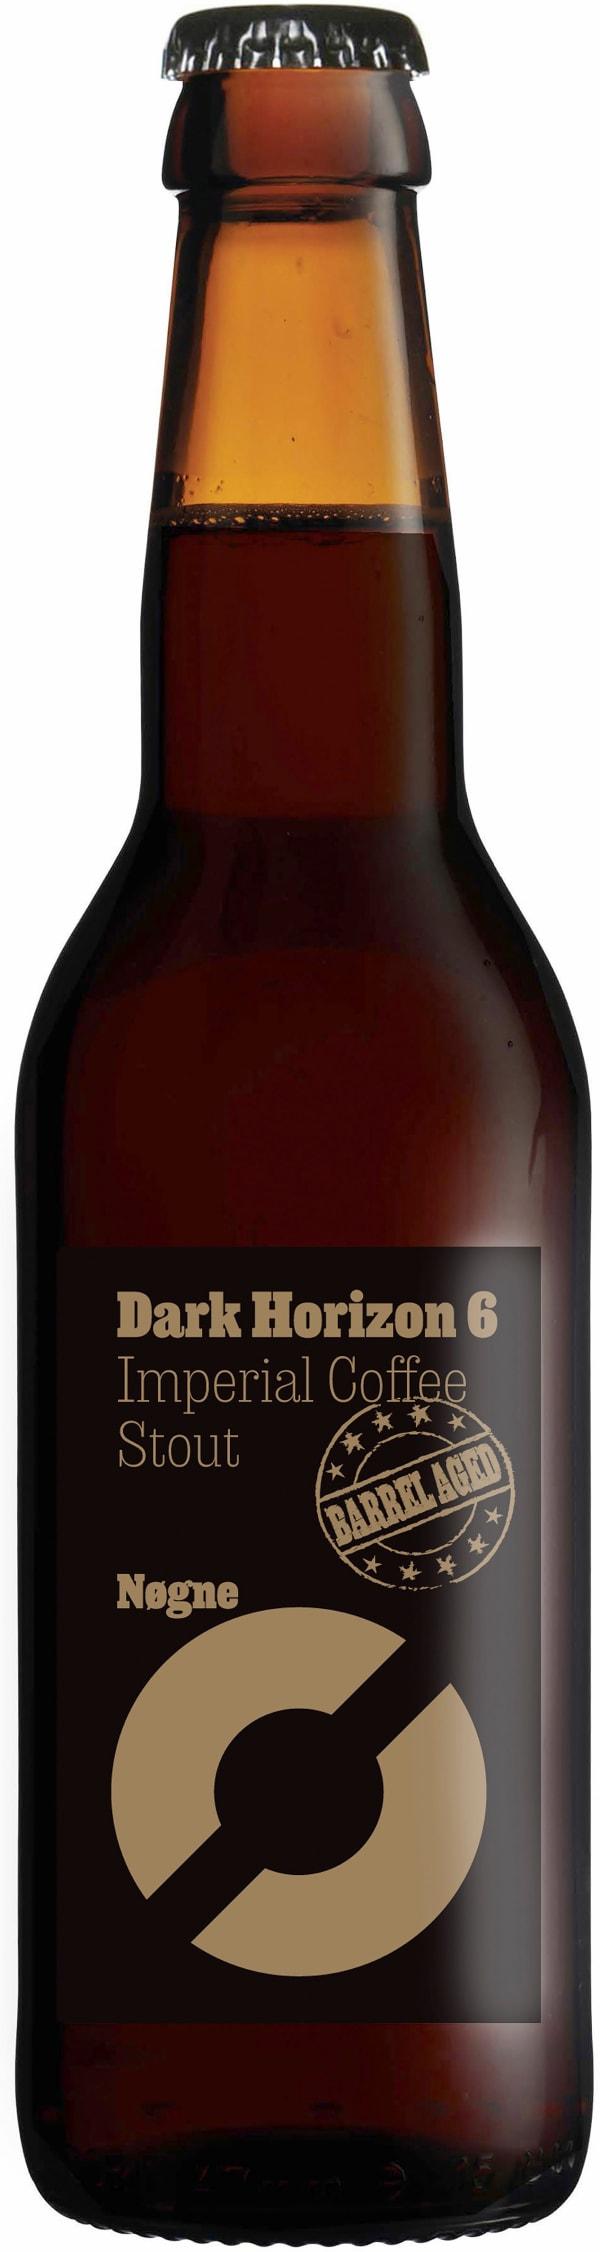 Nøgne Ø Dark Horizon 6 Imperial Coffee Stout